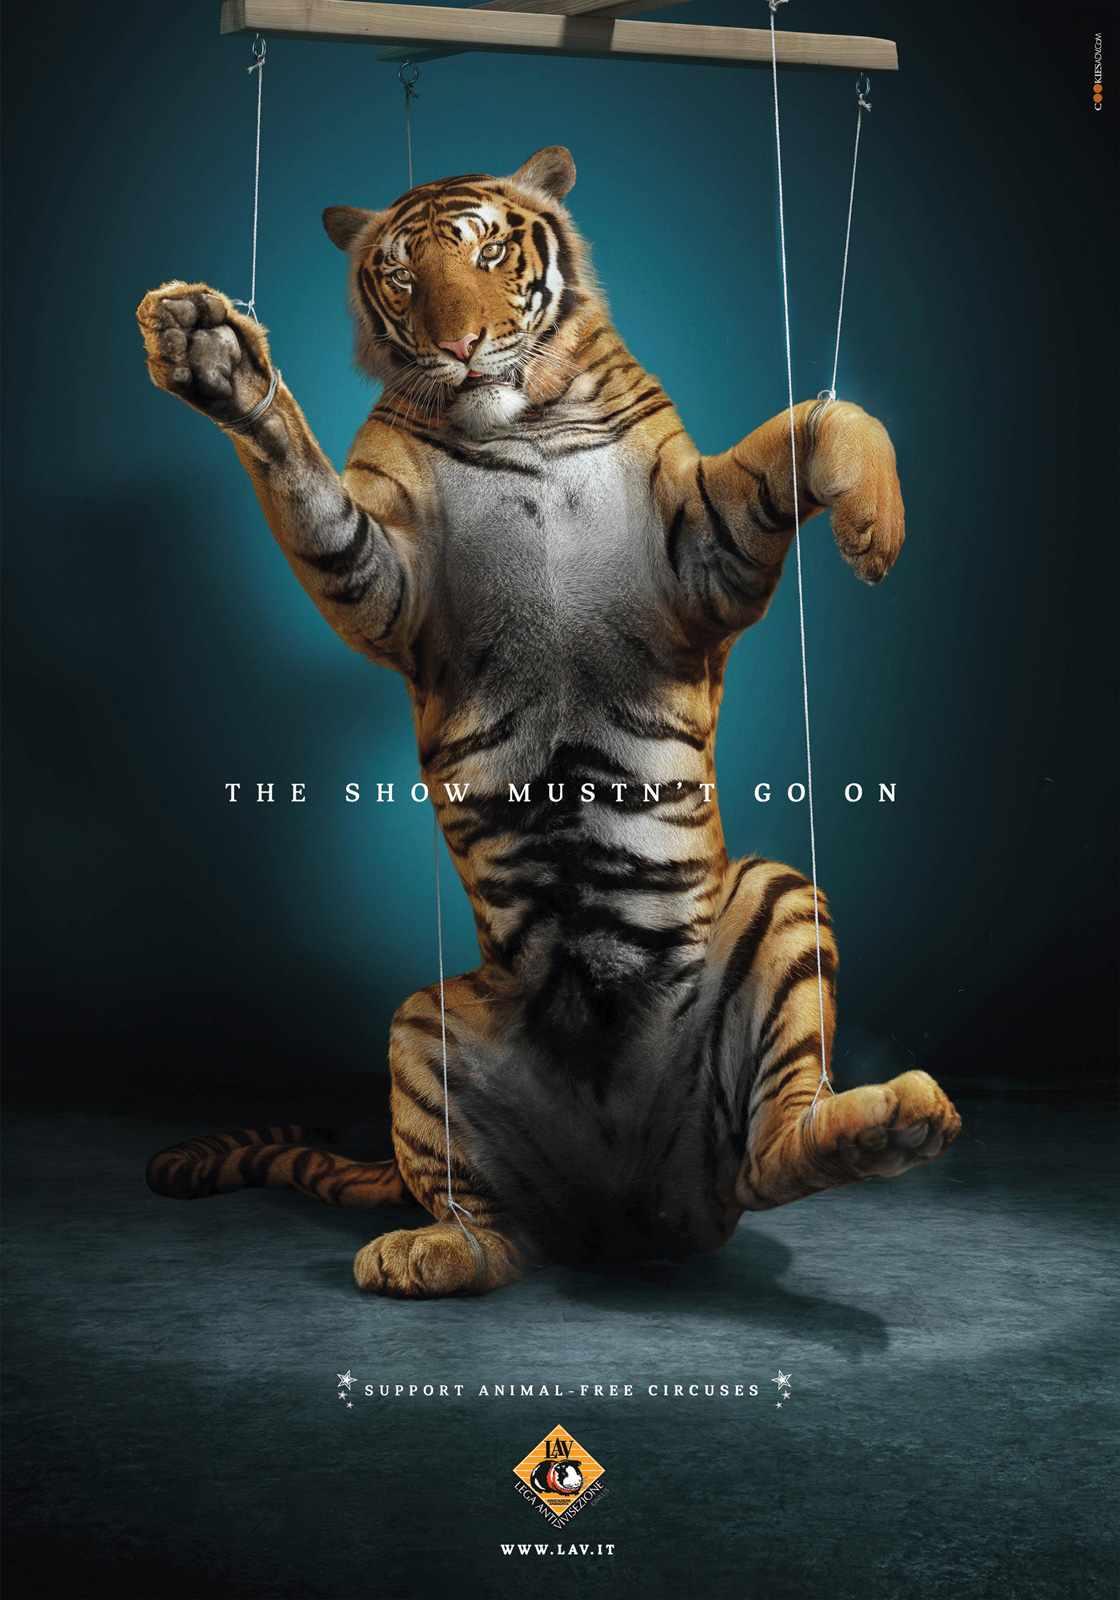 Ad campaigns against animal cruelty | constancegilfedder